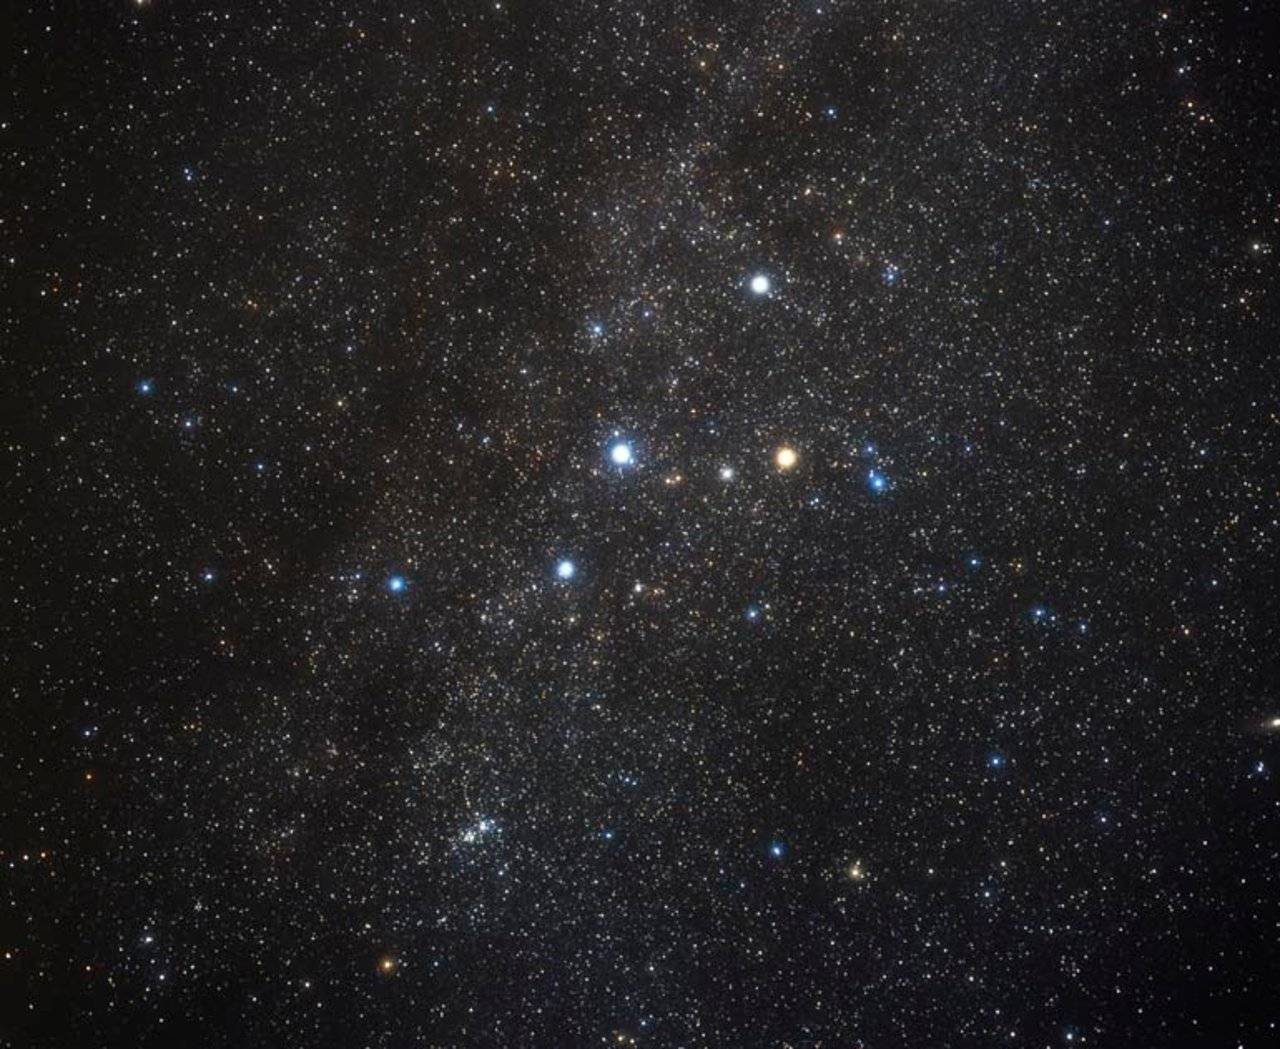 Científicos descubren un planeta hecho de rubíes y zafiros a tan solo 21 años luz de distancia